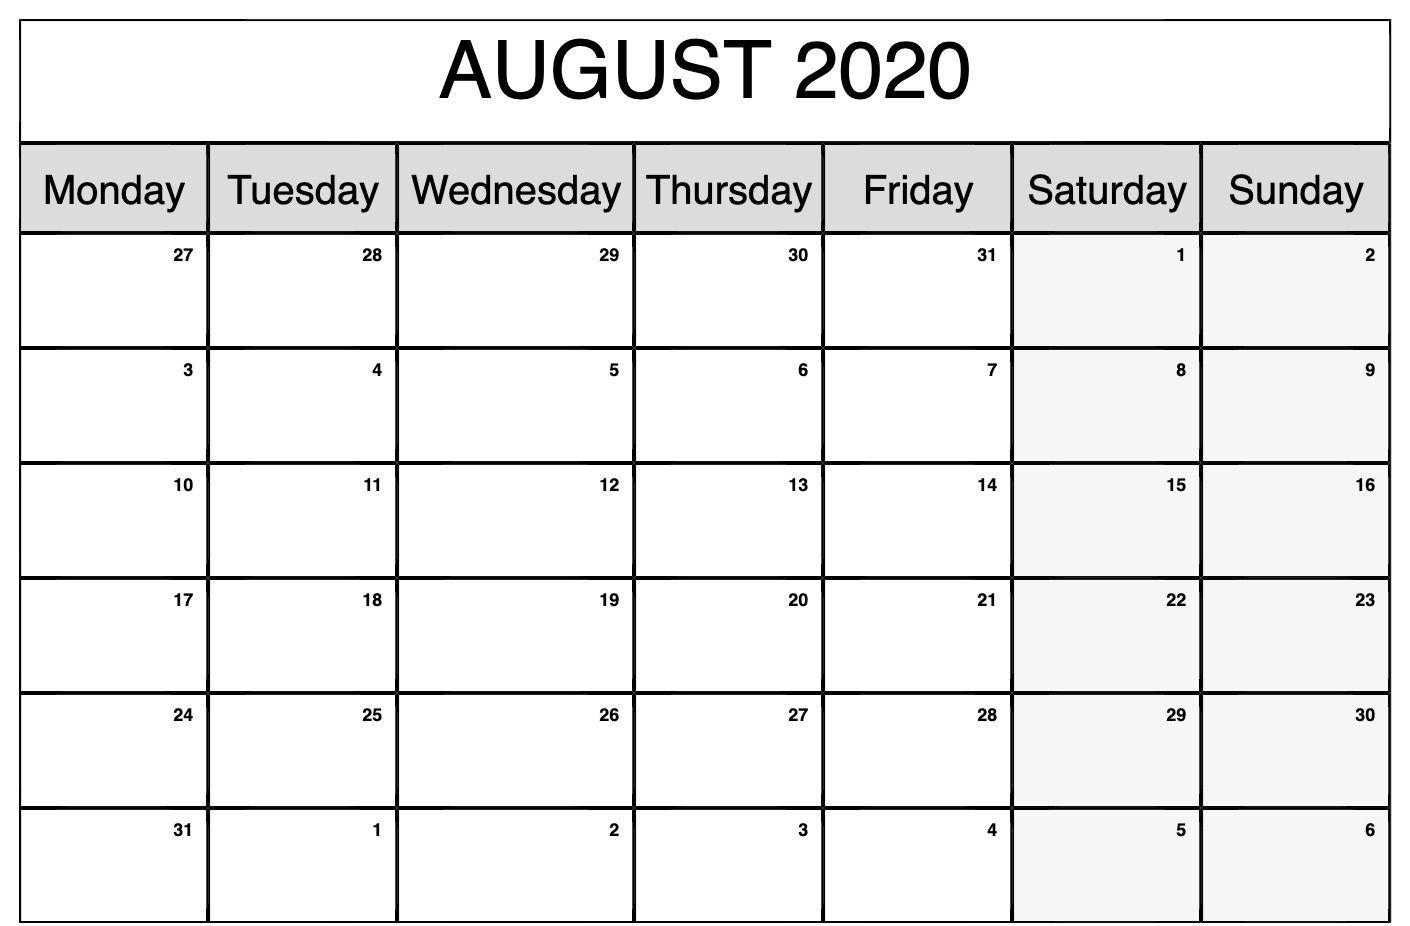 Fillable August 2020 Calendar Blank Template Free Printable